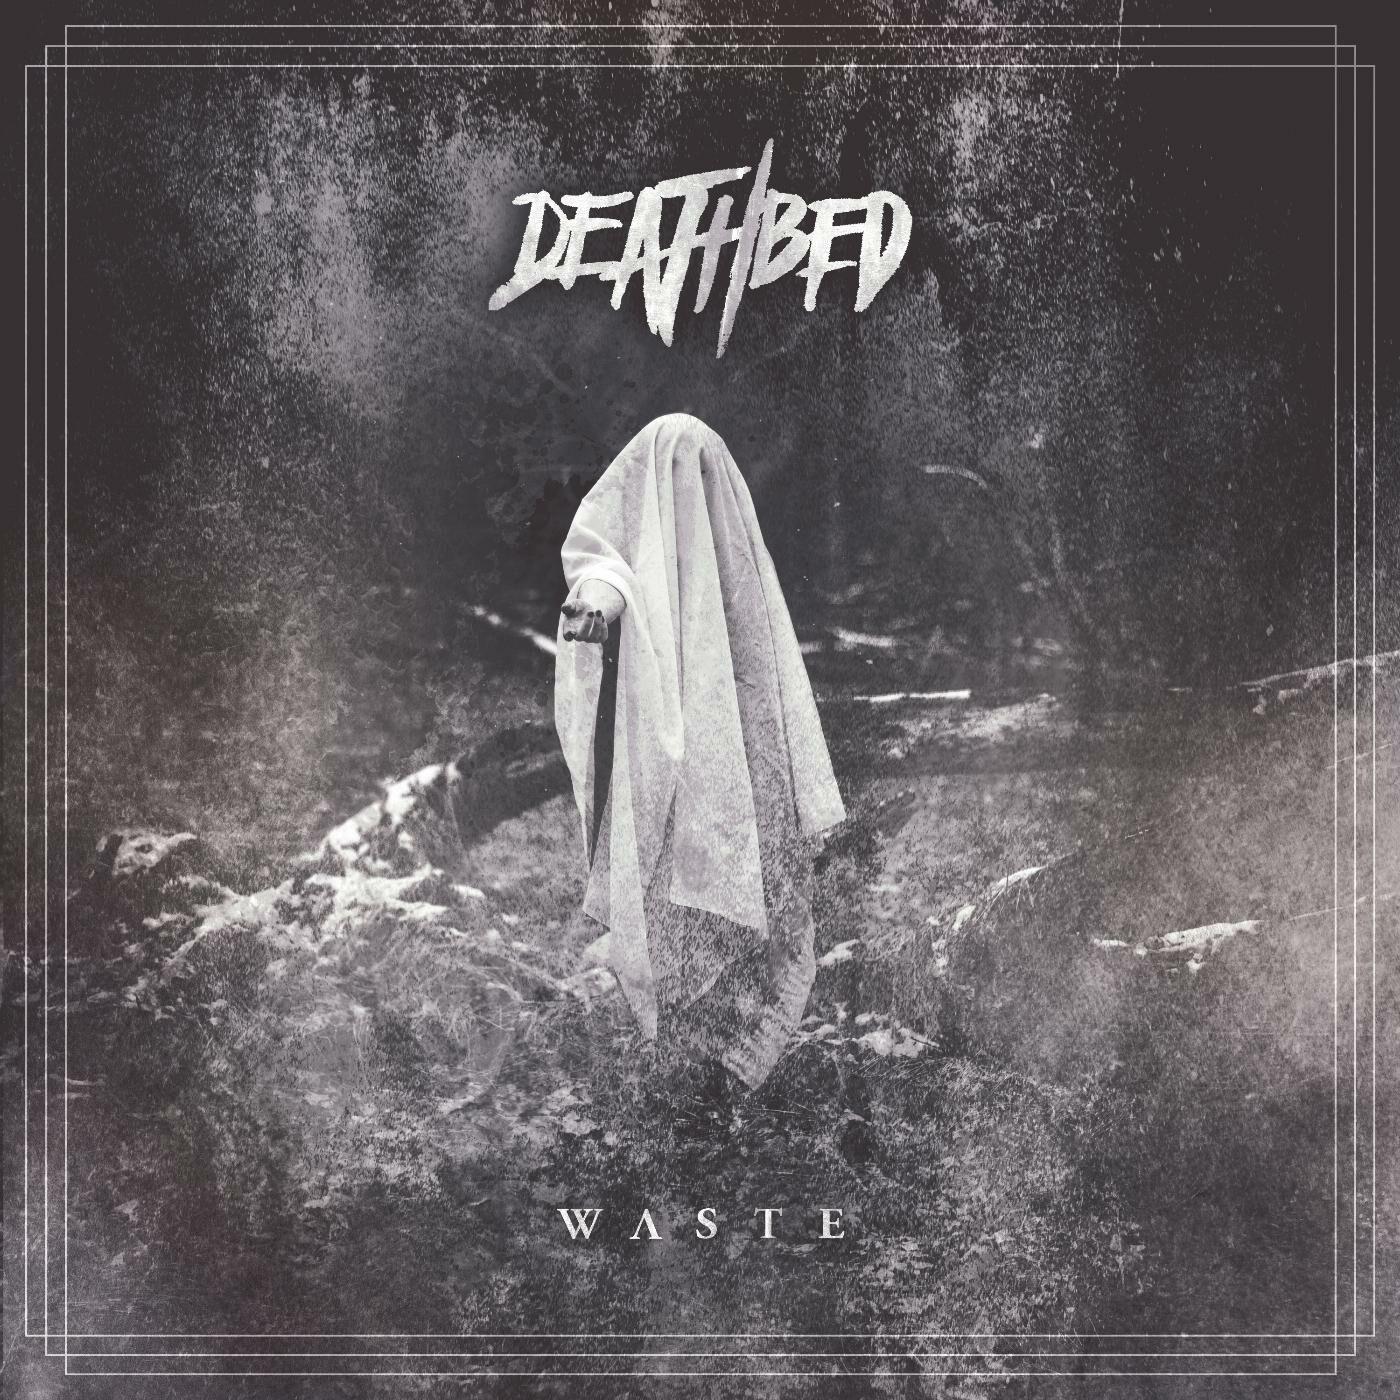 Deathbed - Waste [single] (2016)